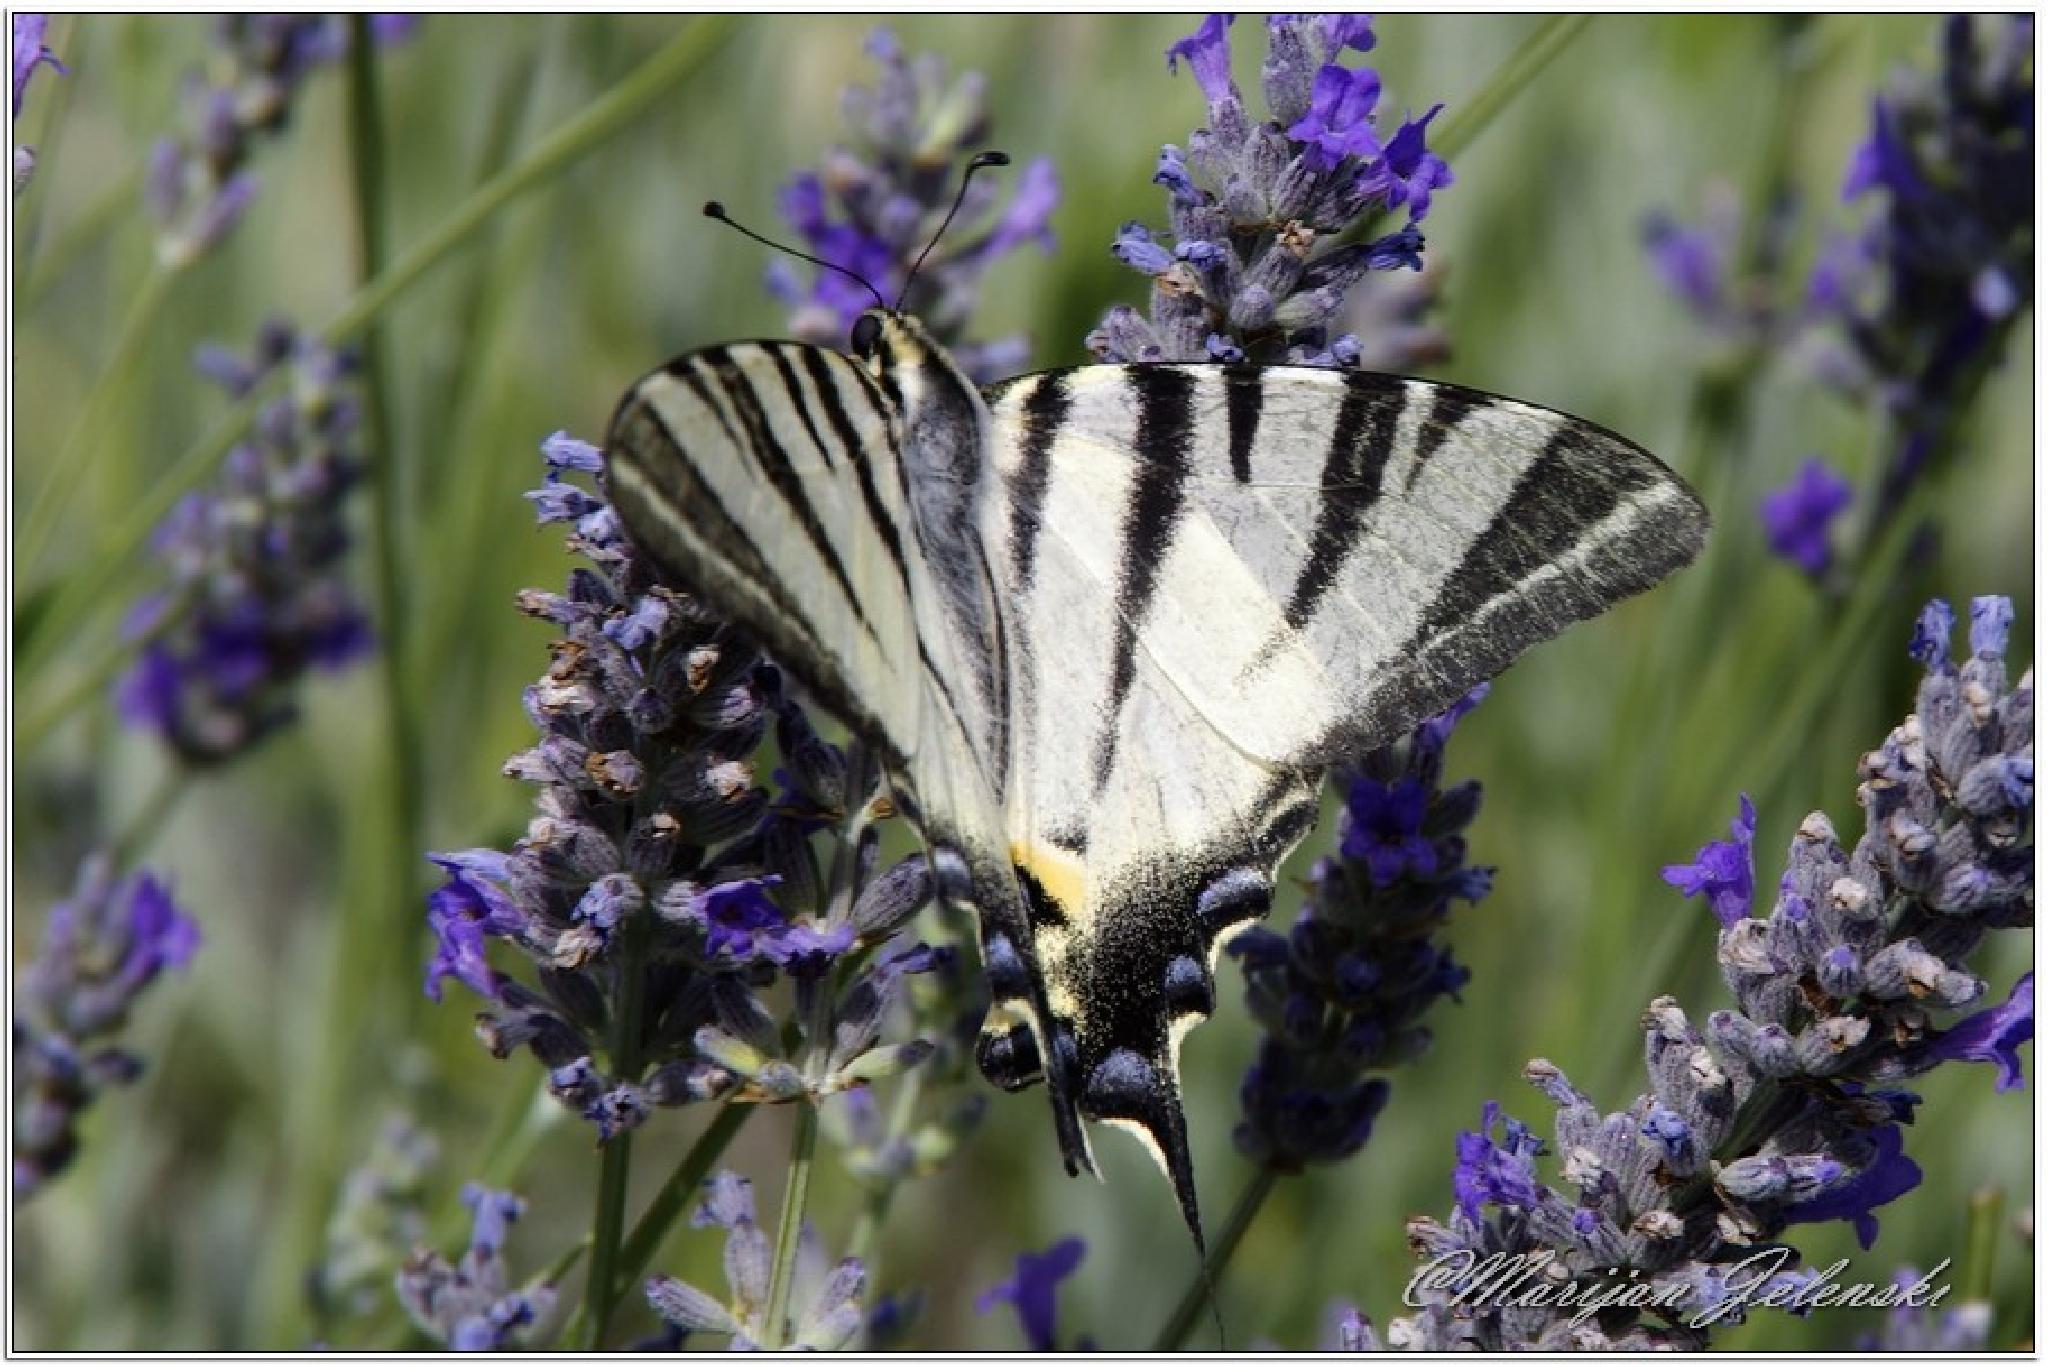 Lastin rep (lat. Papilio machaon) by Marijan Jelenski